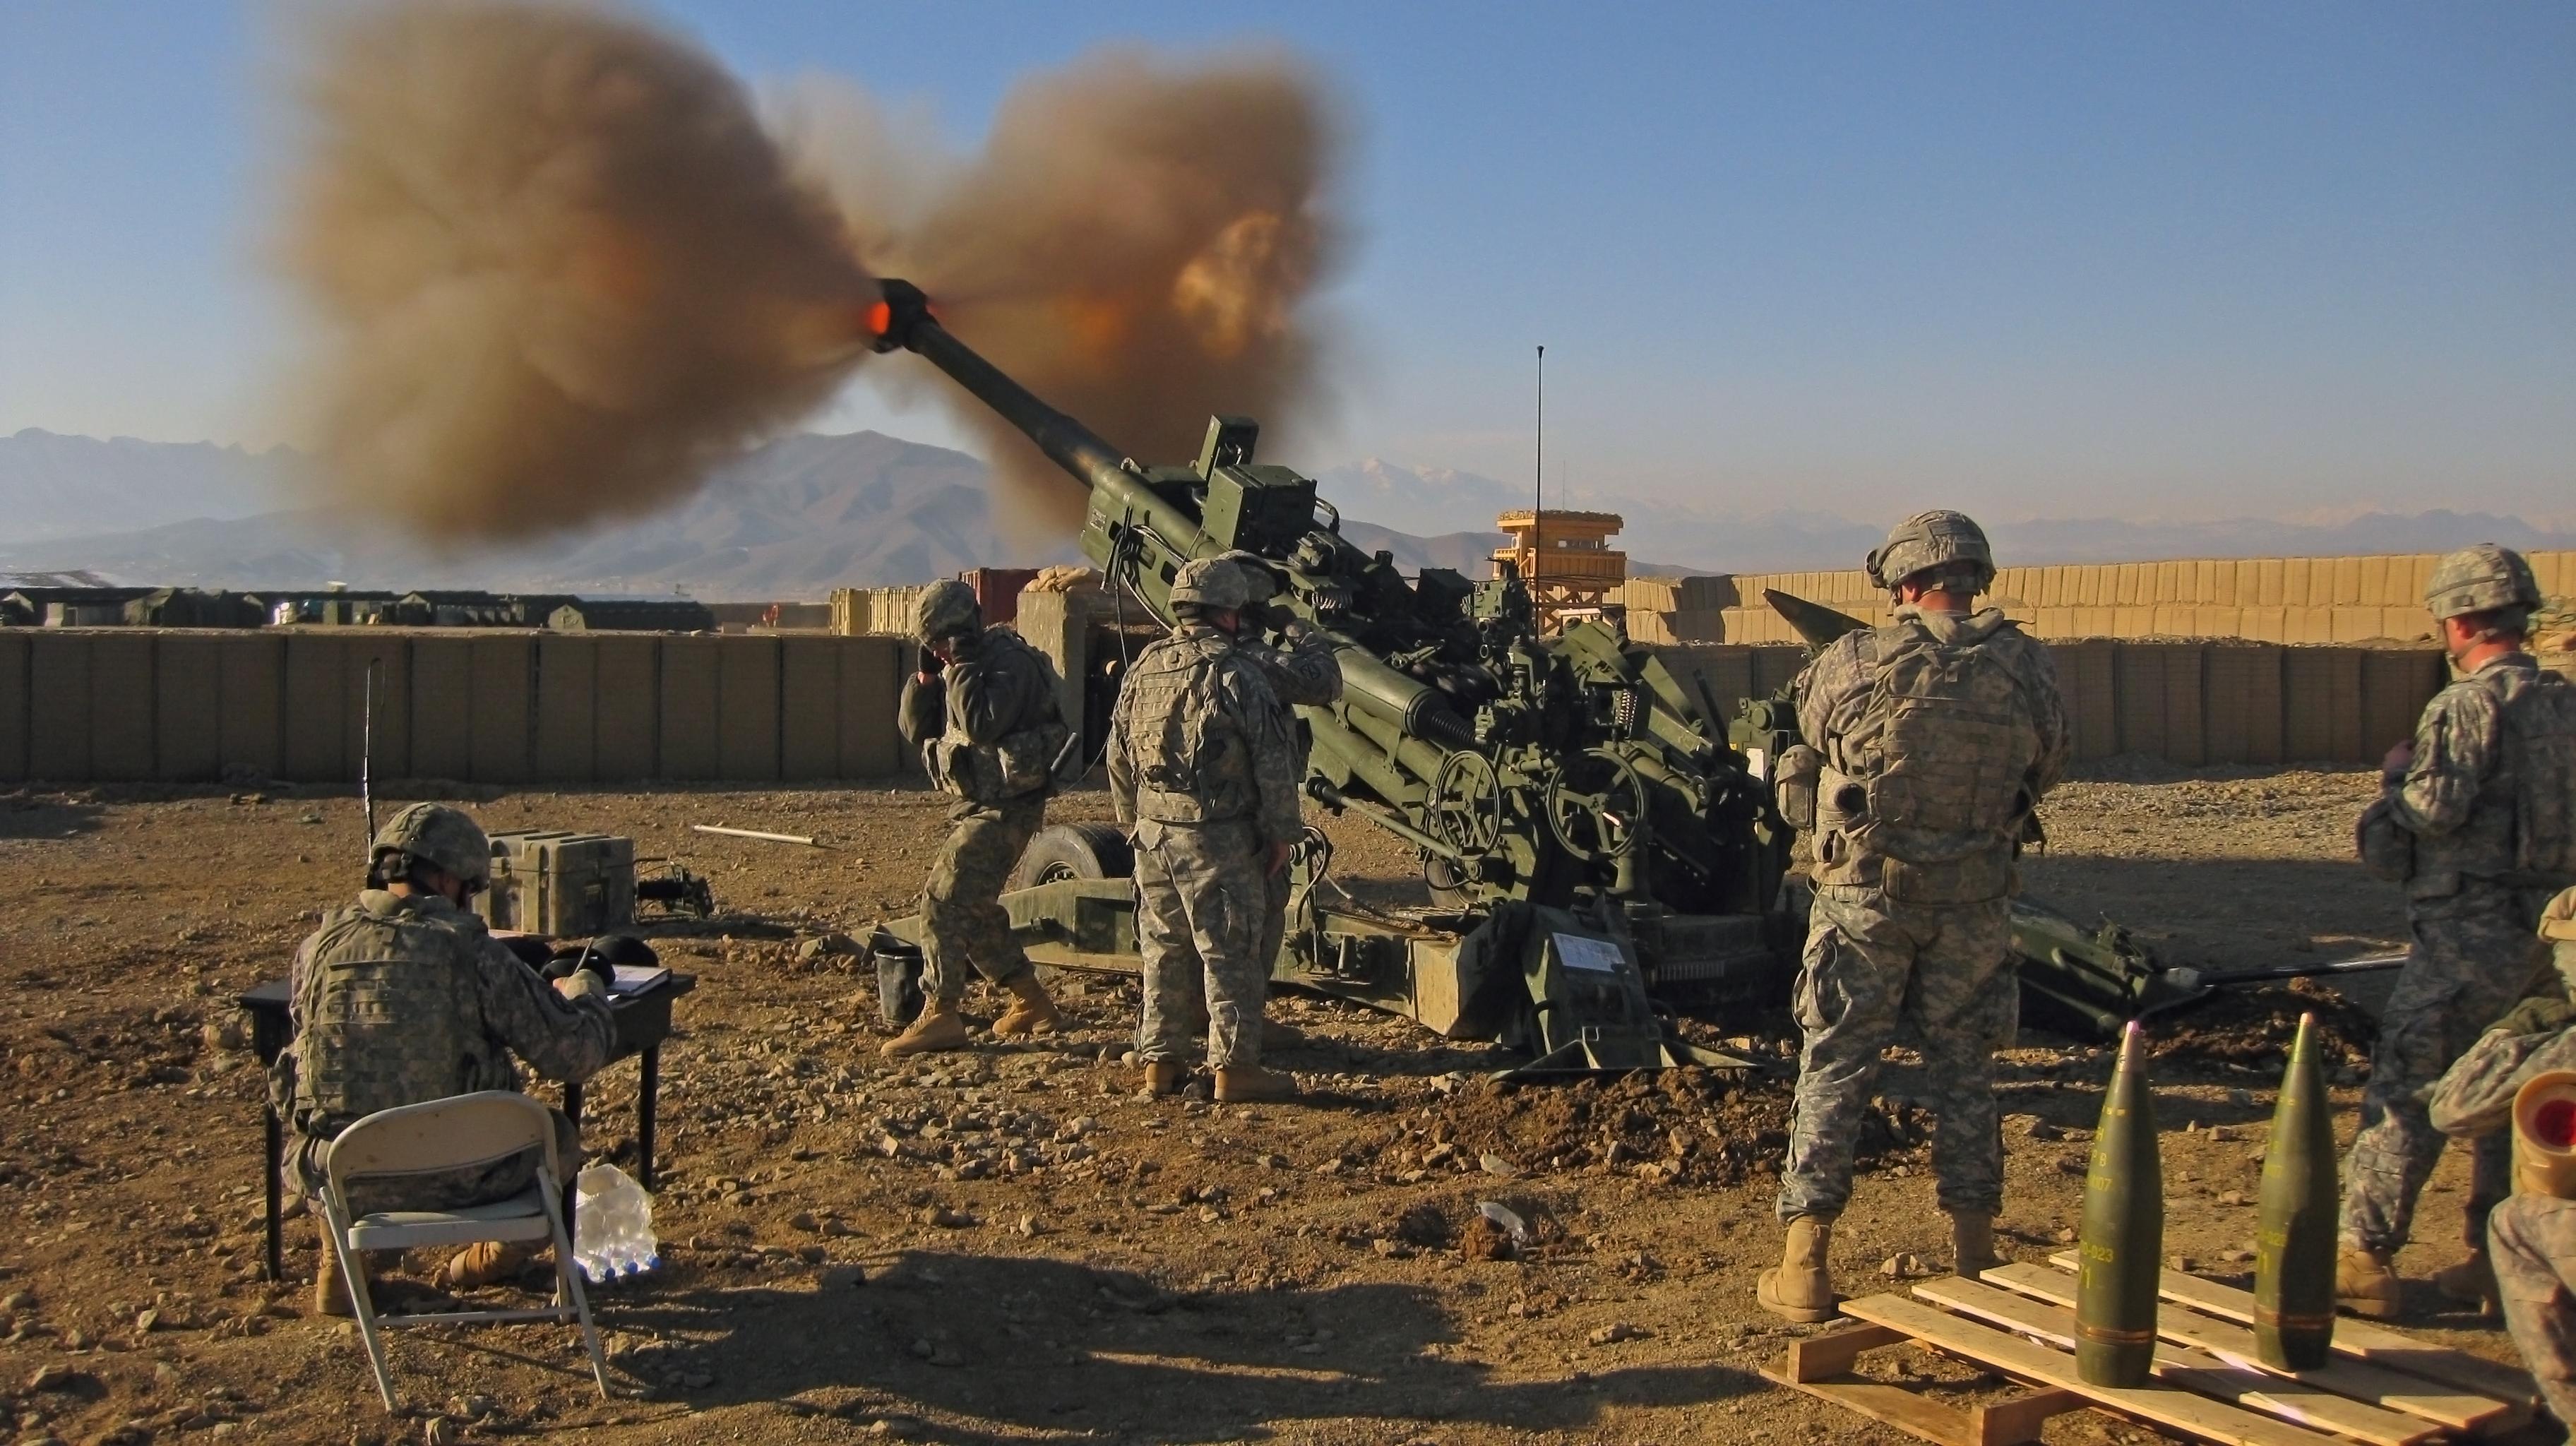 M777 howitzer - Wikipedia